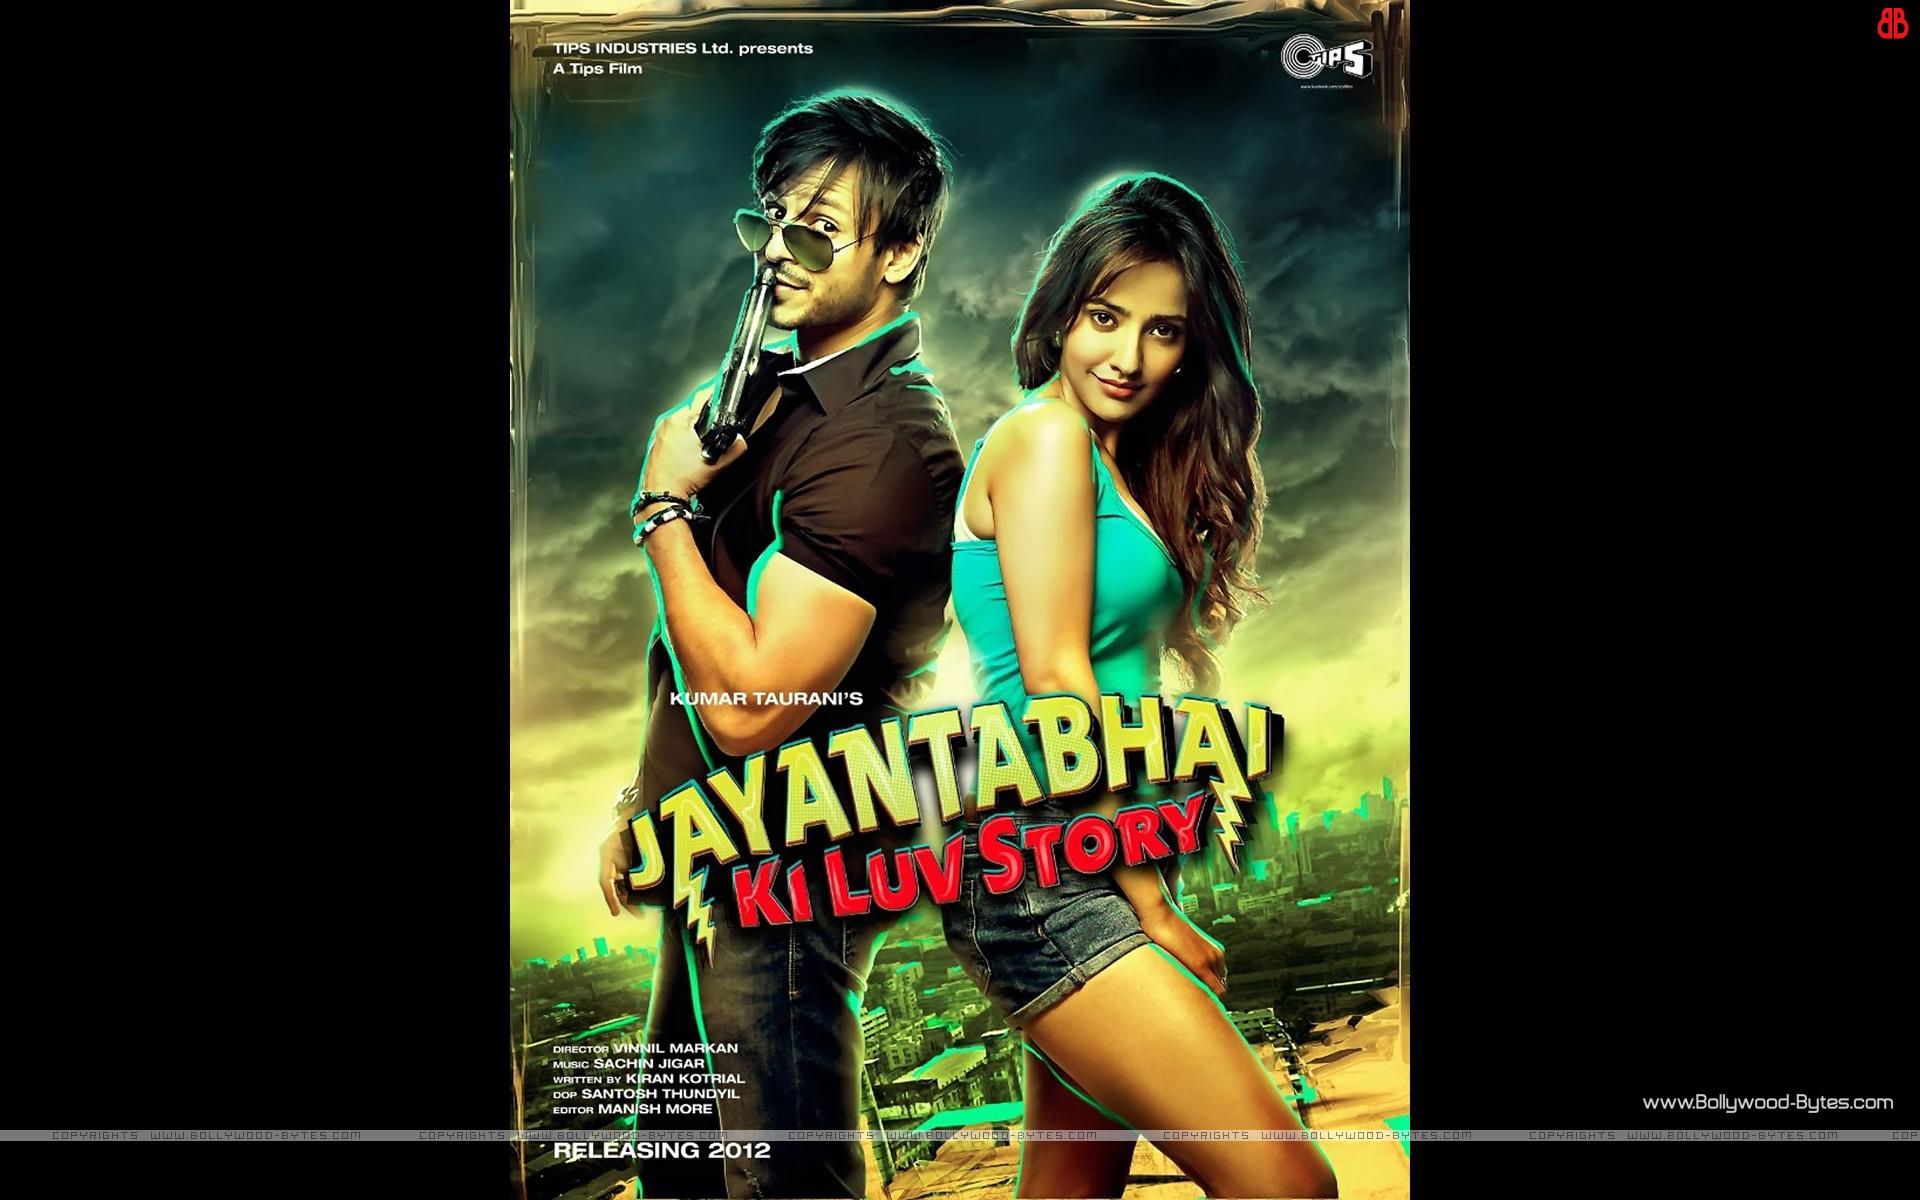 http://4.bp.blogspot.com/-09gyz2eiLRA/UMD5MSd88NI/AAAAAAAAUro/XDV3daWX9jc/s1920/Jayanta-Bhai-Ki-Luv-Story-+Hot-Neha-Sharma-Vivek-Oberoi-HD-Wallpaper-0.jpg